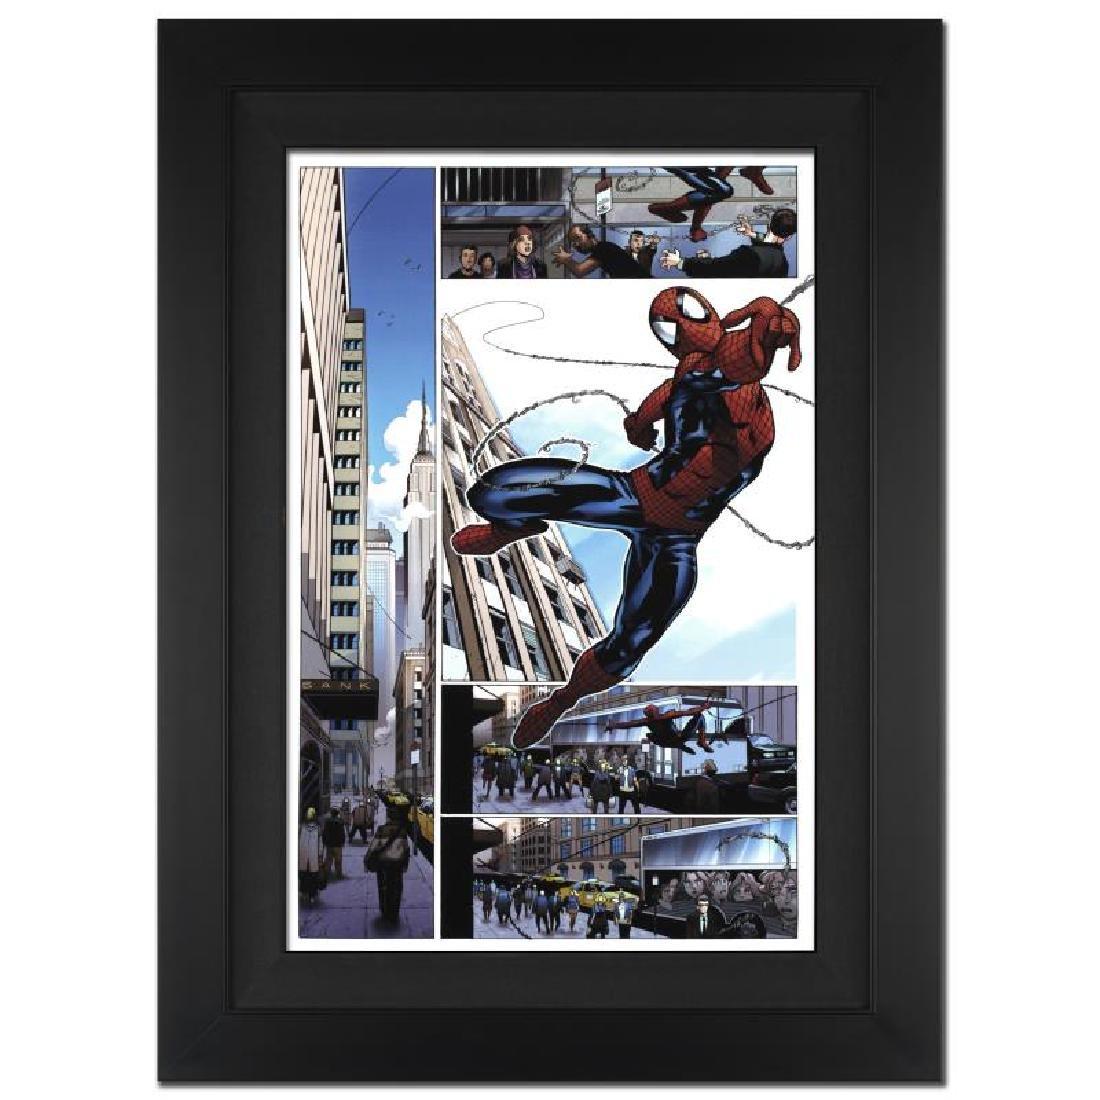 Astonishing Spider-Man & Wolverine #1 by Stan Lee -